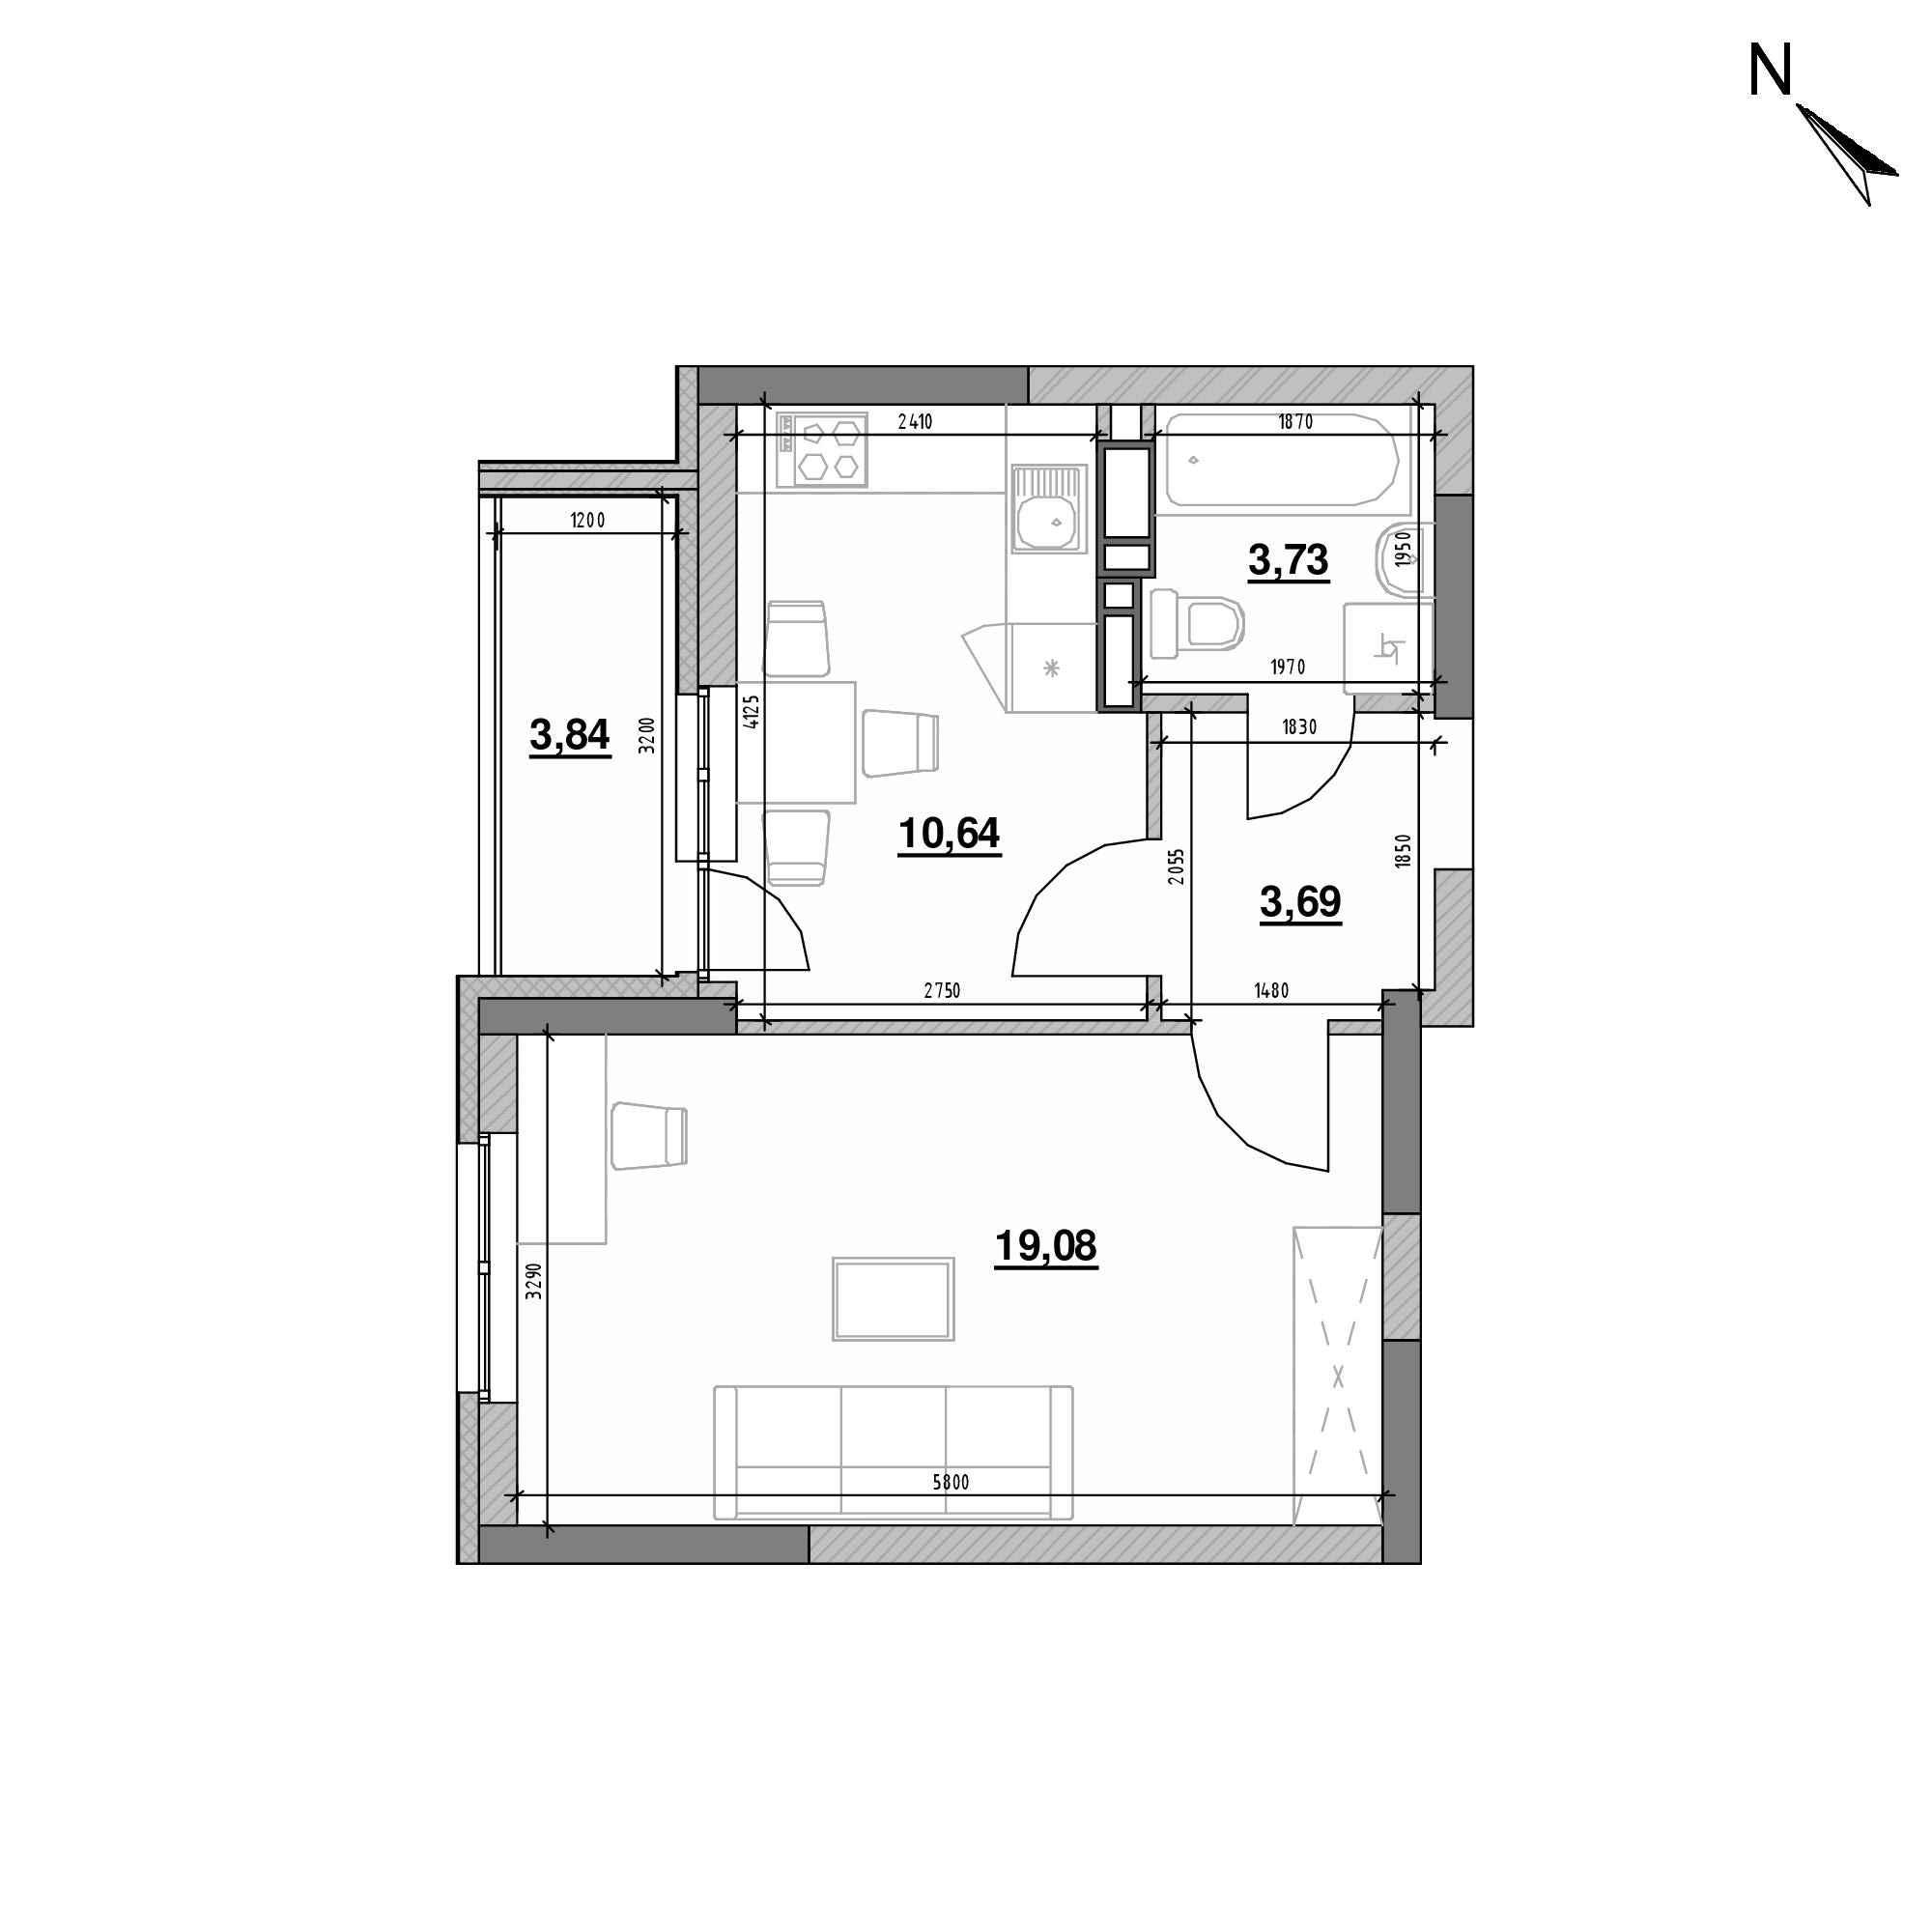 ЖК Оk'Land: планування 1-кімнатної квартири, №185, 40.98 м<sup>2</sup>